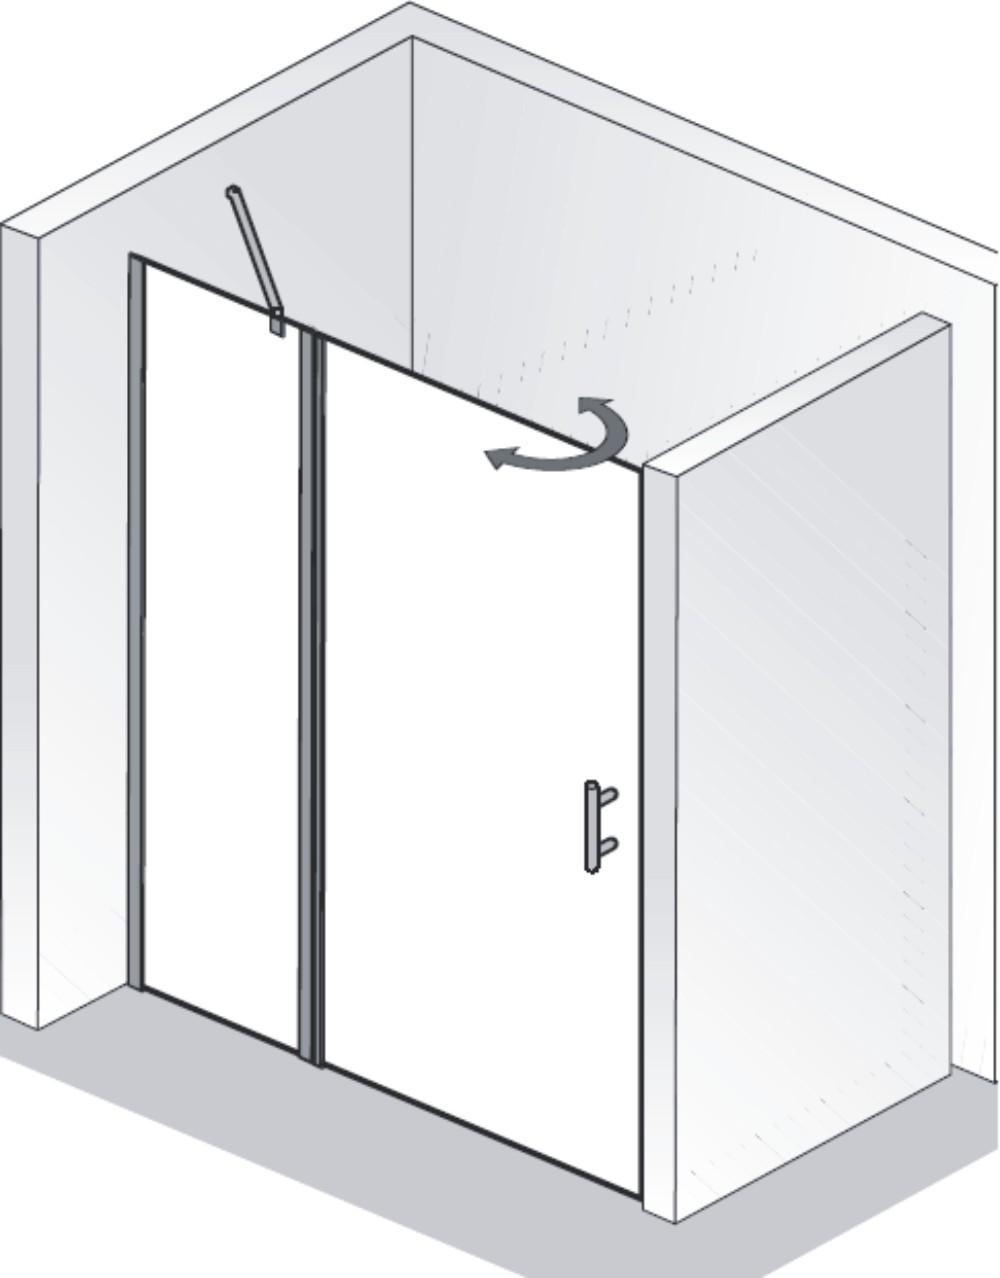 hsk duschkabine favorit nova c nischendusche 1 dreht r arcom center. Black Bedroom Furniture Sets. Home Design Ideas